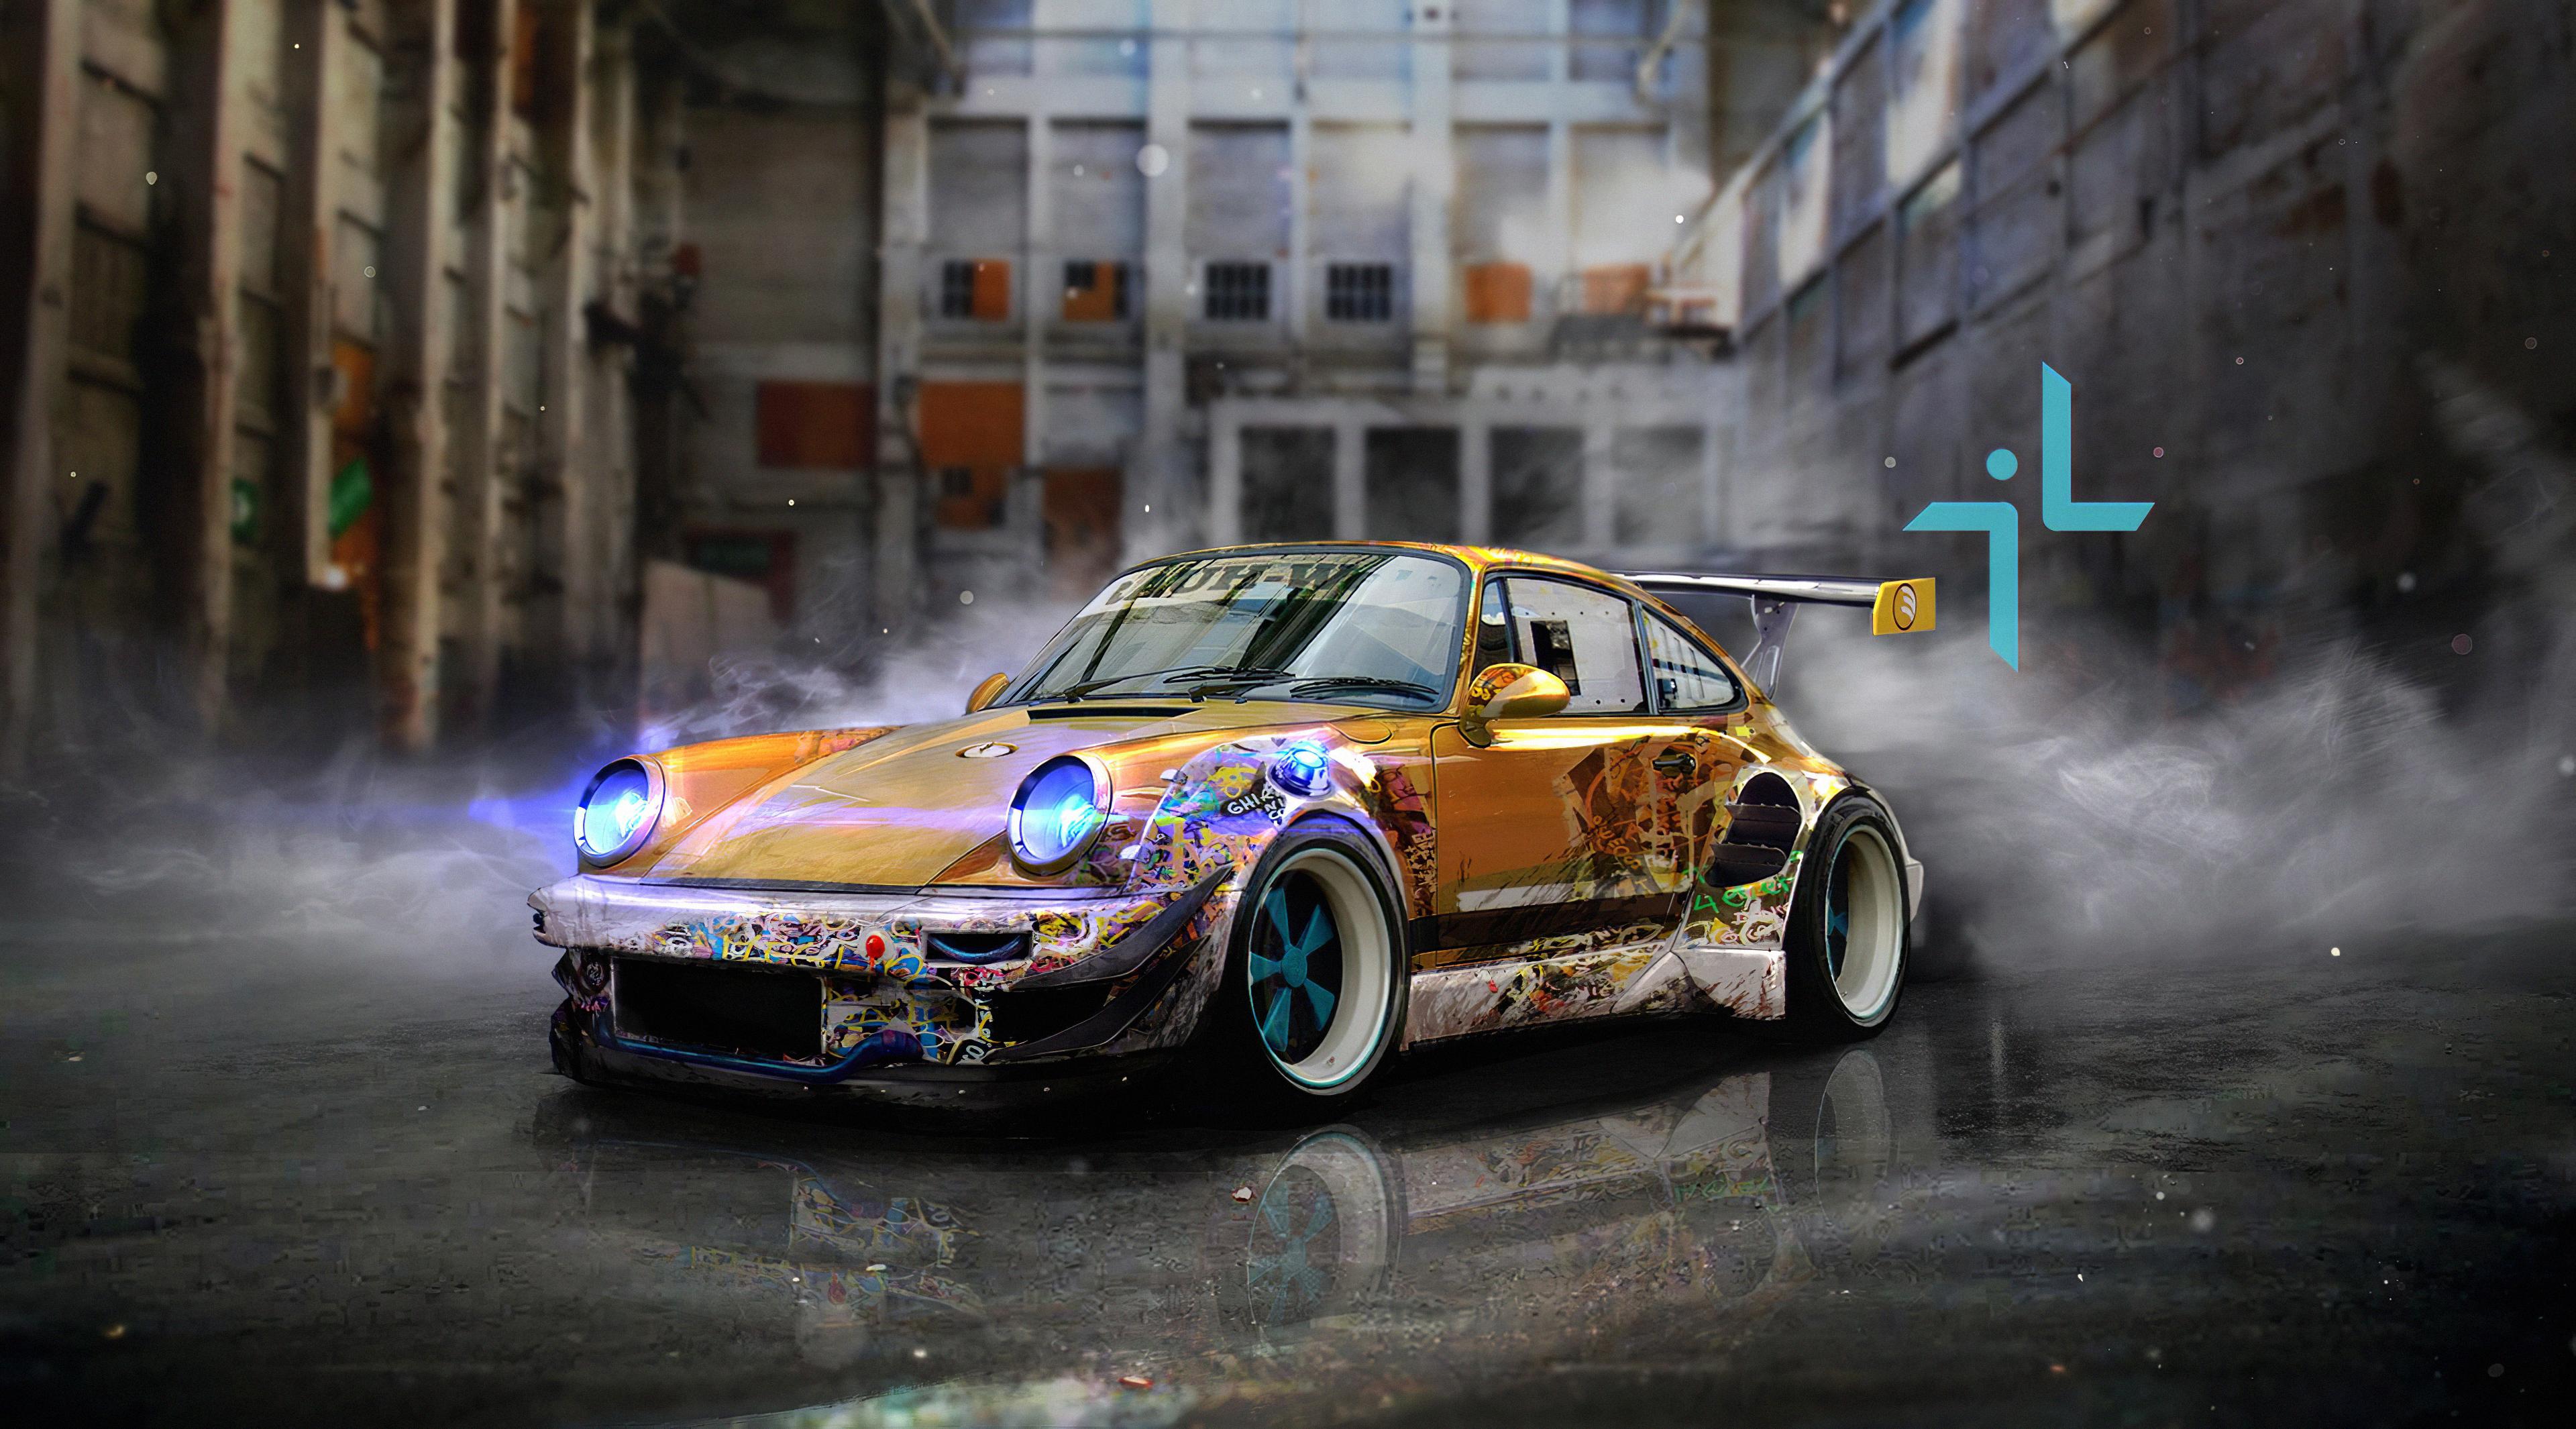 porsche 911 concept art 1577653813 - Porsche 911 Concept Art - Porsche 911 Concept Art 4k wallpaper